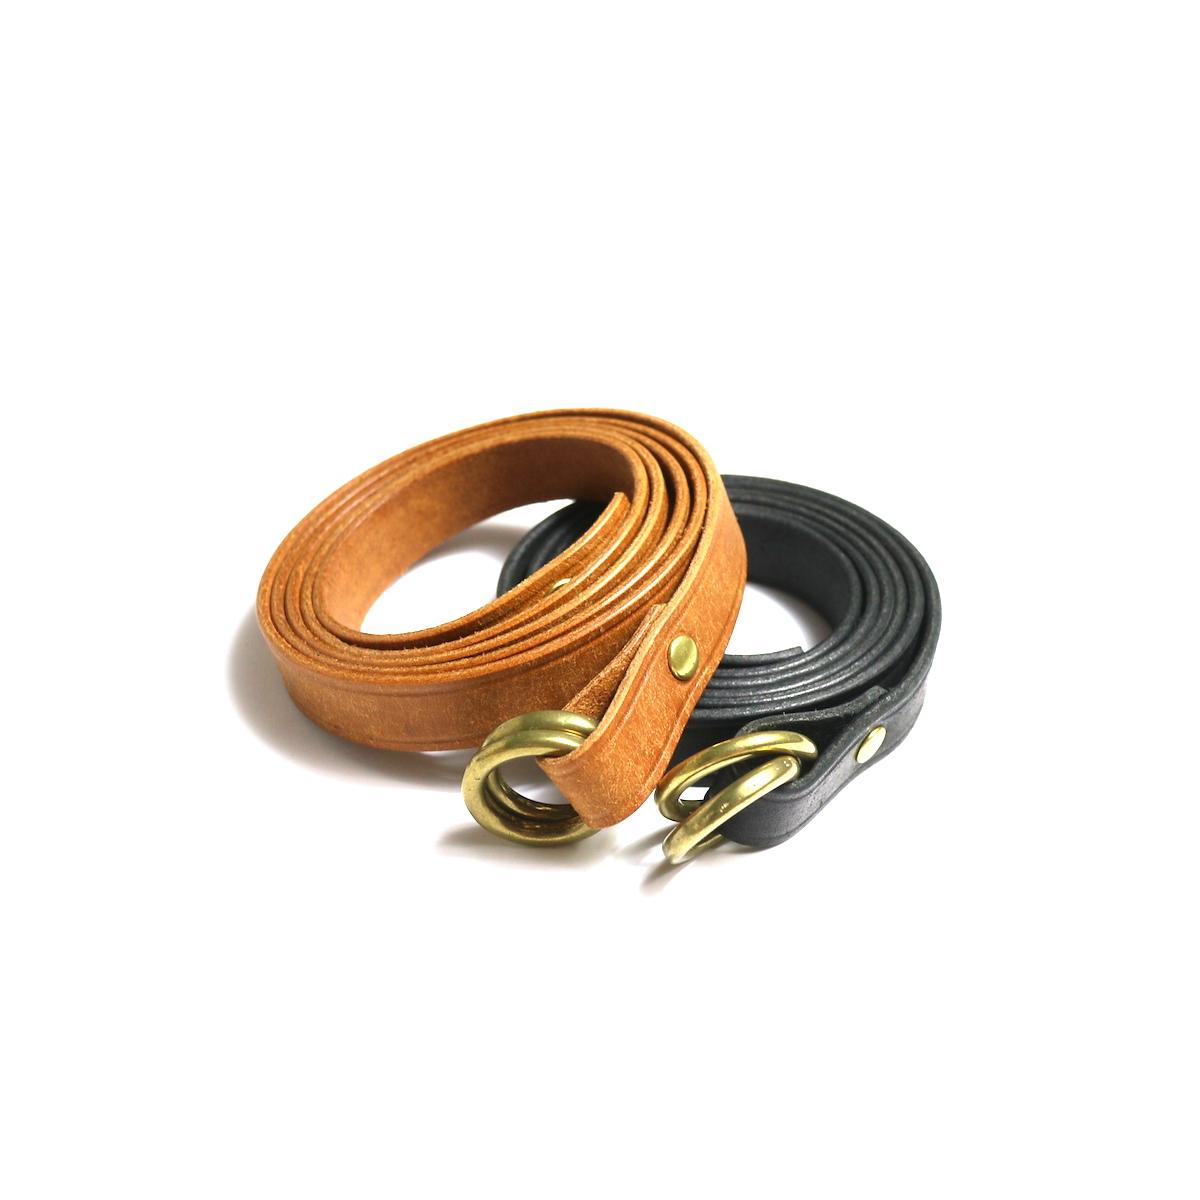 MASTER & Co. / 15mm W Ring Belt